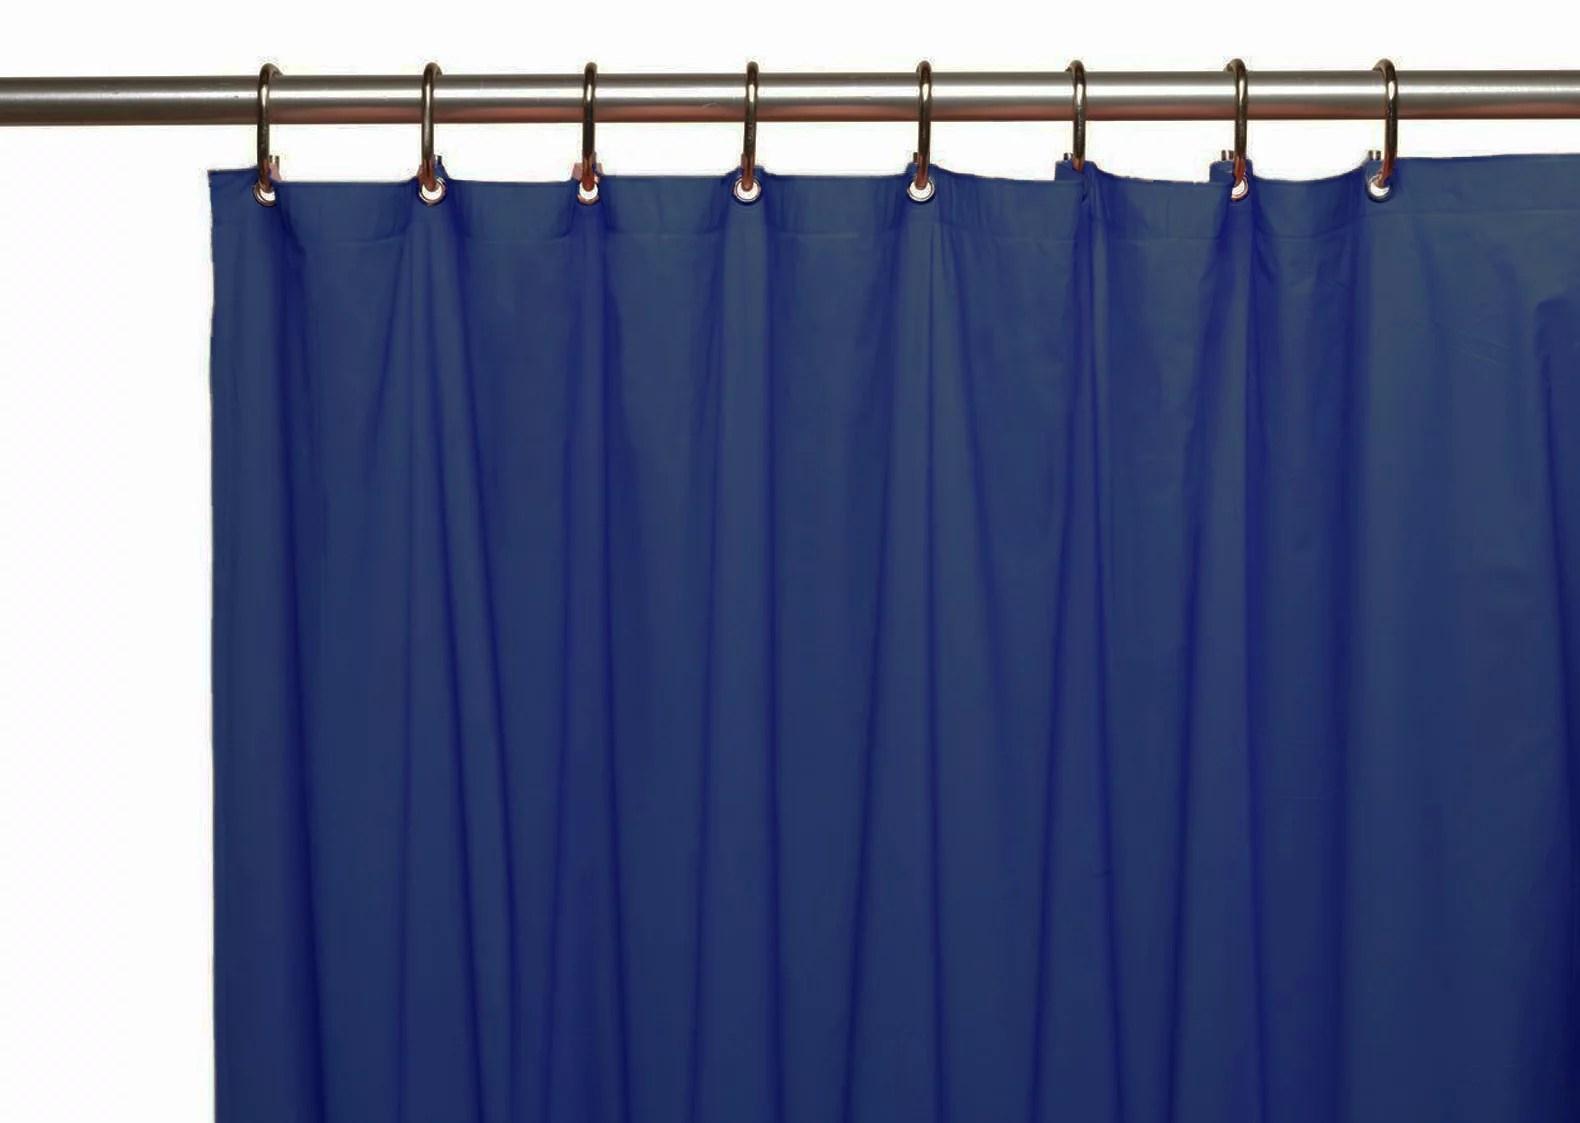 venice elegant home heavy duty vinyl shower curtain liner with 12 metal grommets navy blue